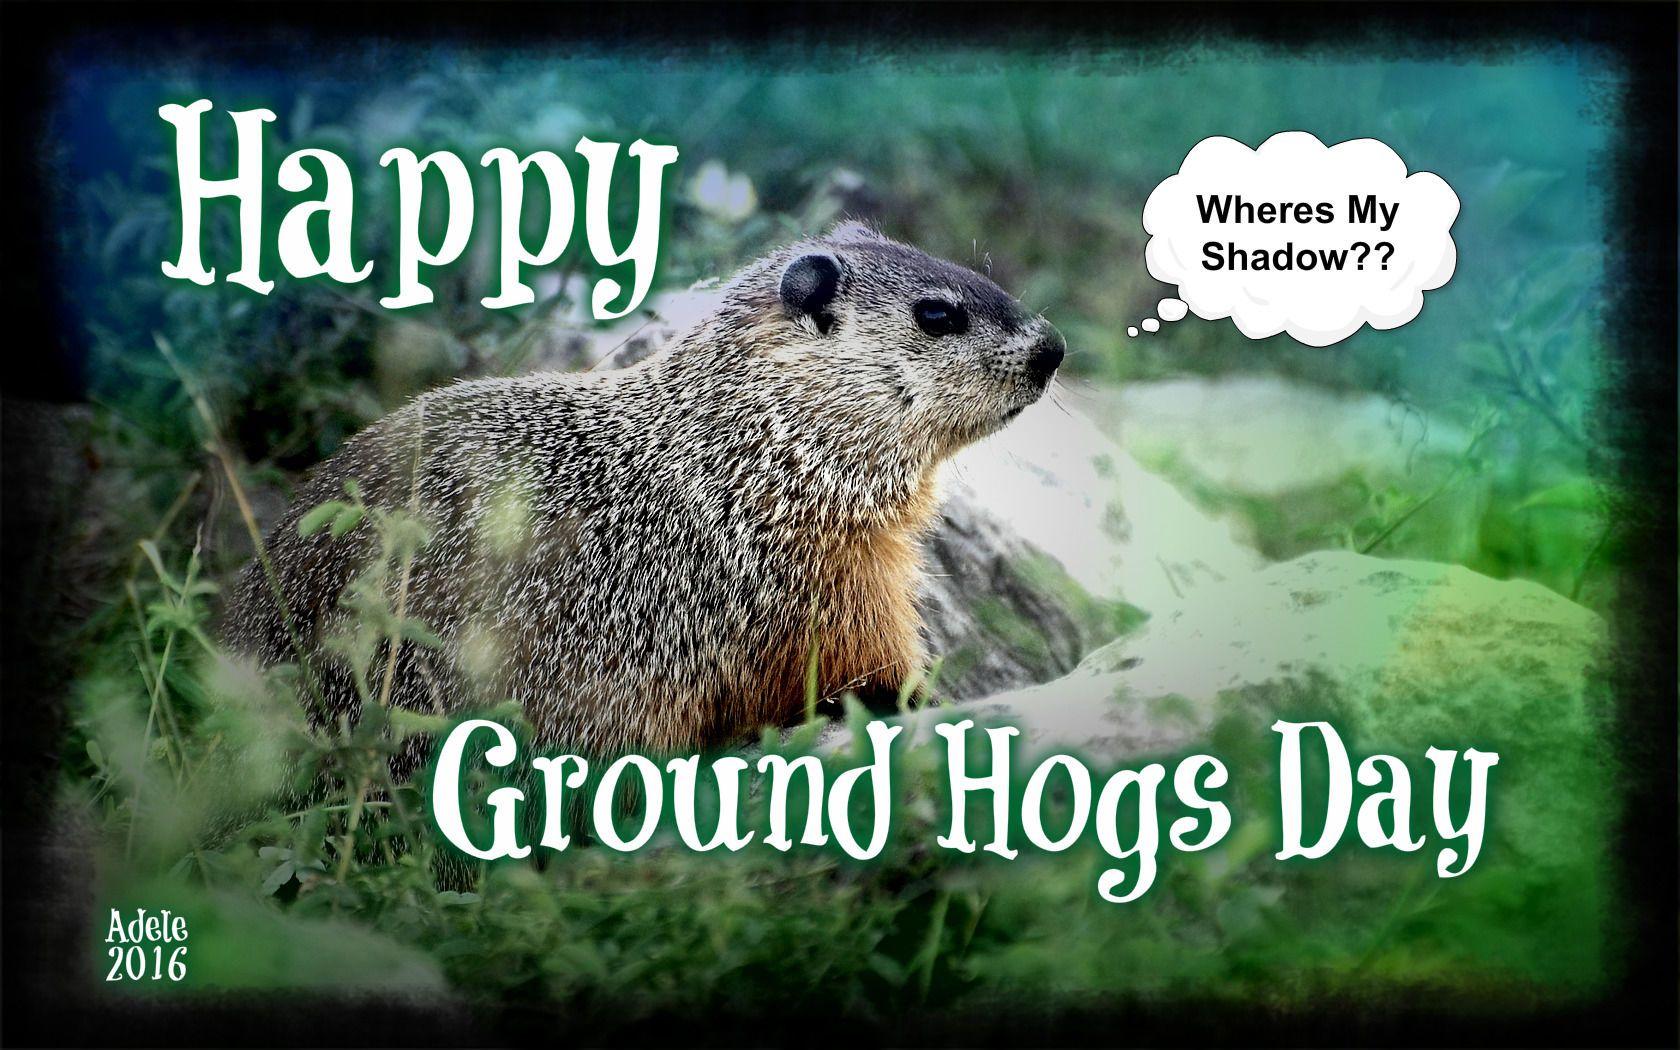 Ground Hogs Day Groundhog Day Movie Groundhog Day Groundhog